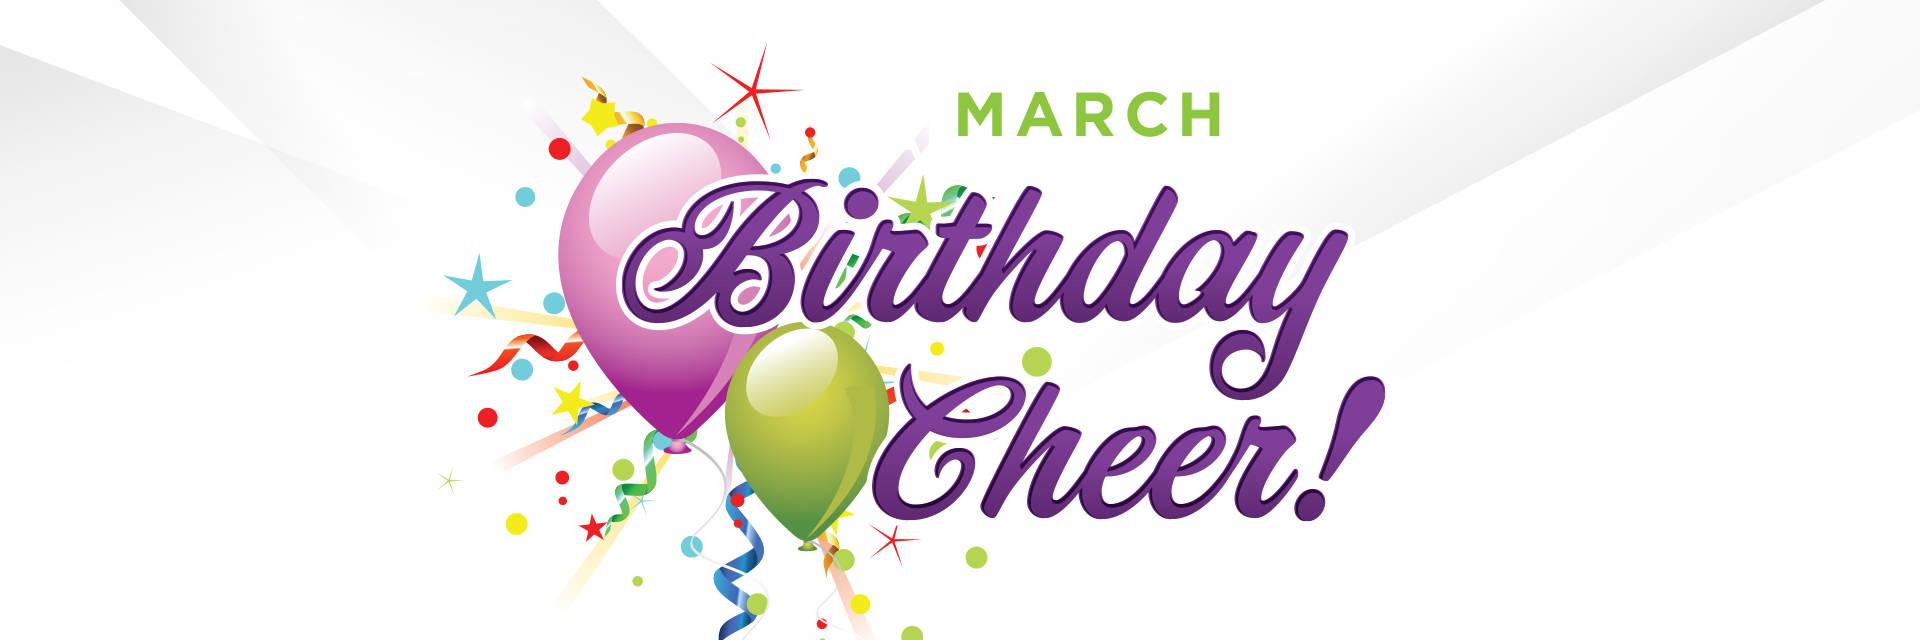 March Birthday Cheer!